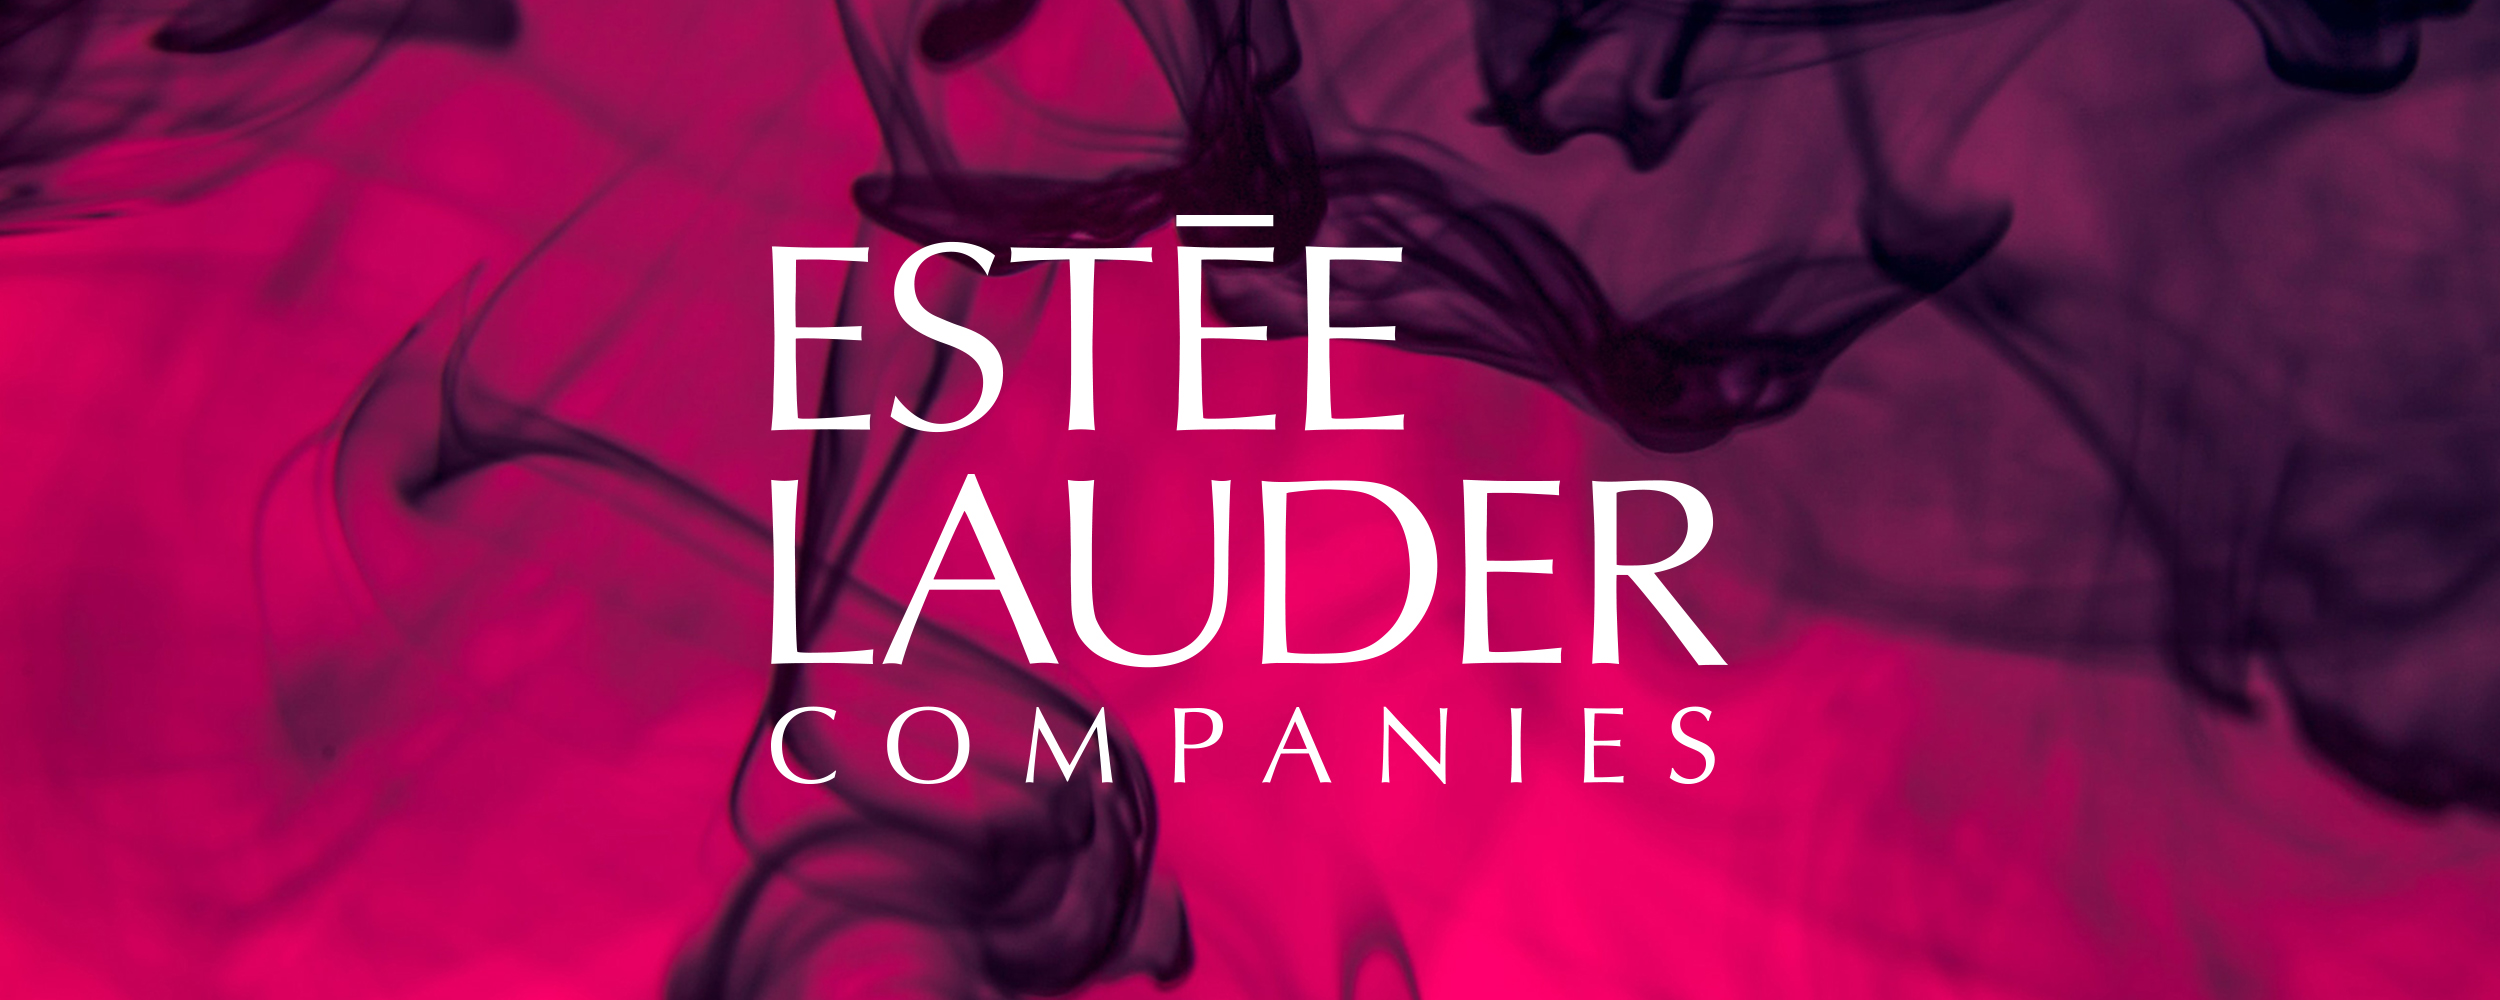 Estée-Lauder-Companies_banner.jpg